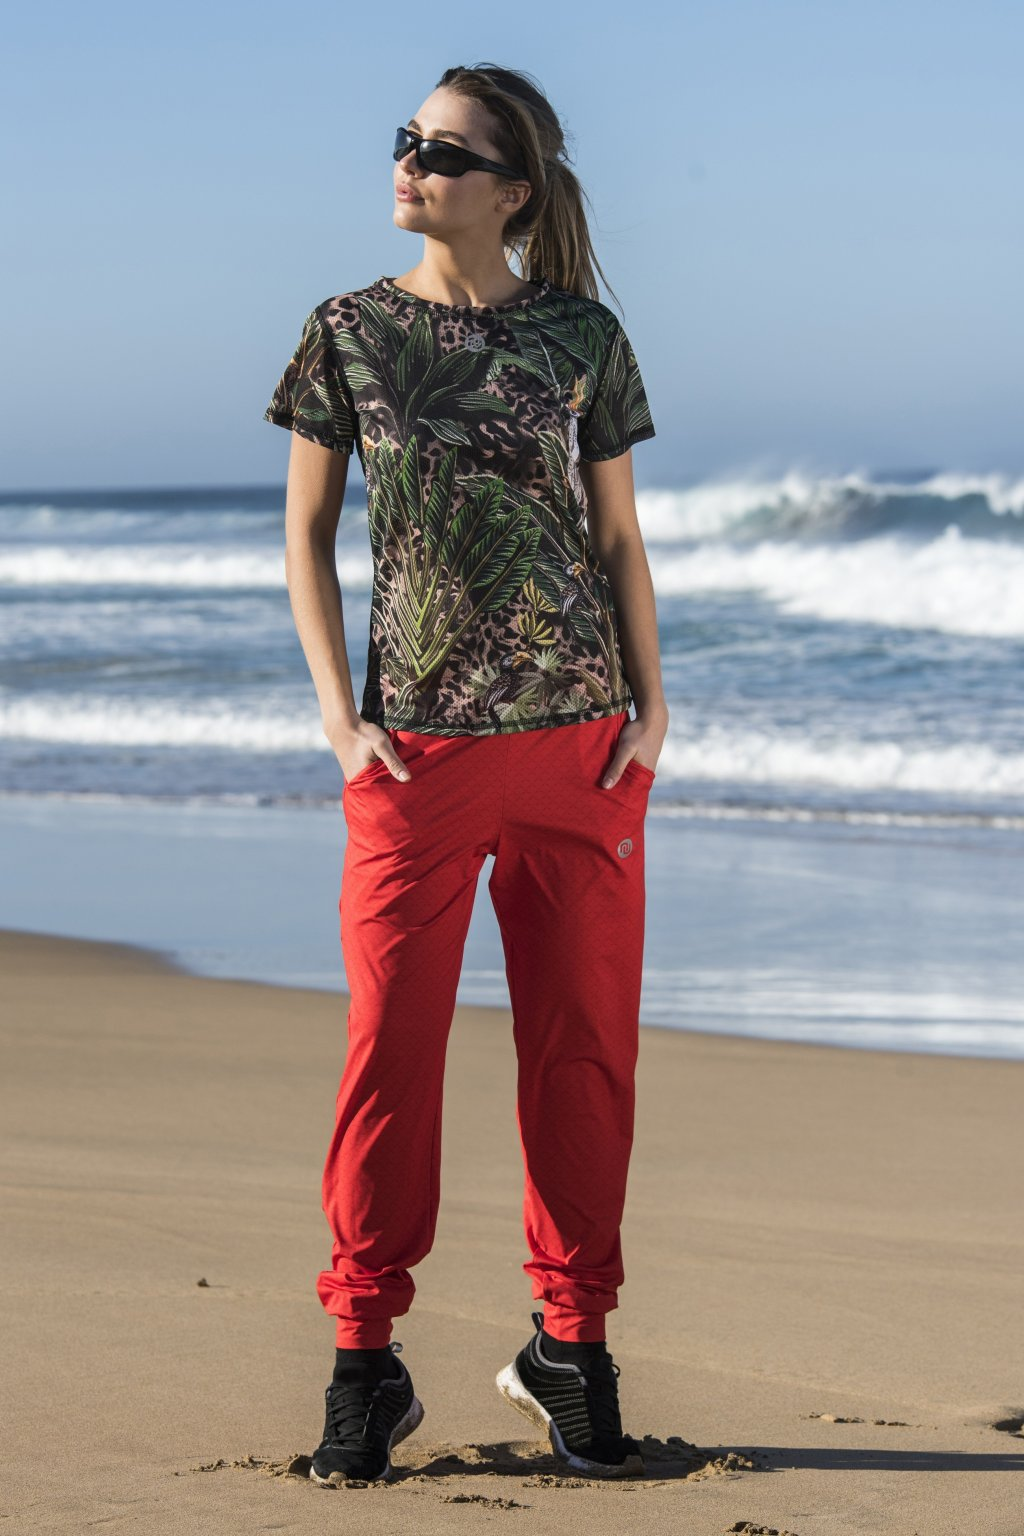 Volné kalhoty red mirage sddc 11x4 1